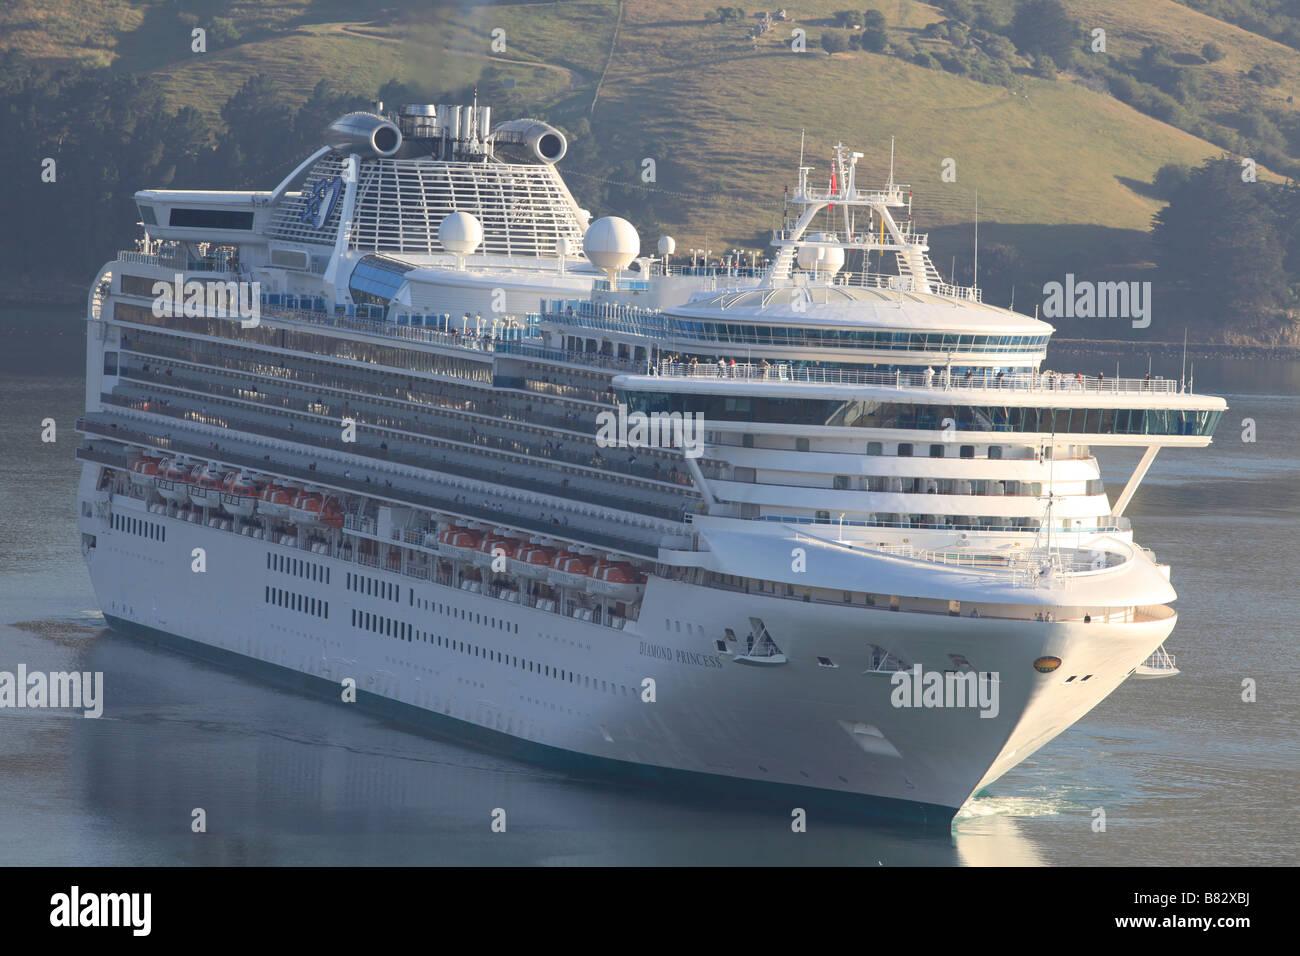 Diamond Princess approaching Port Chalmers,New Zealand - Stock Image